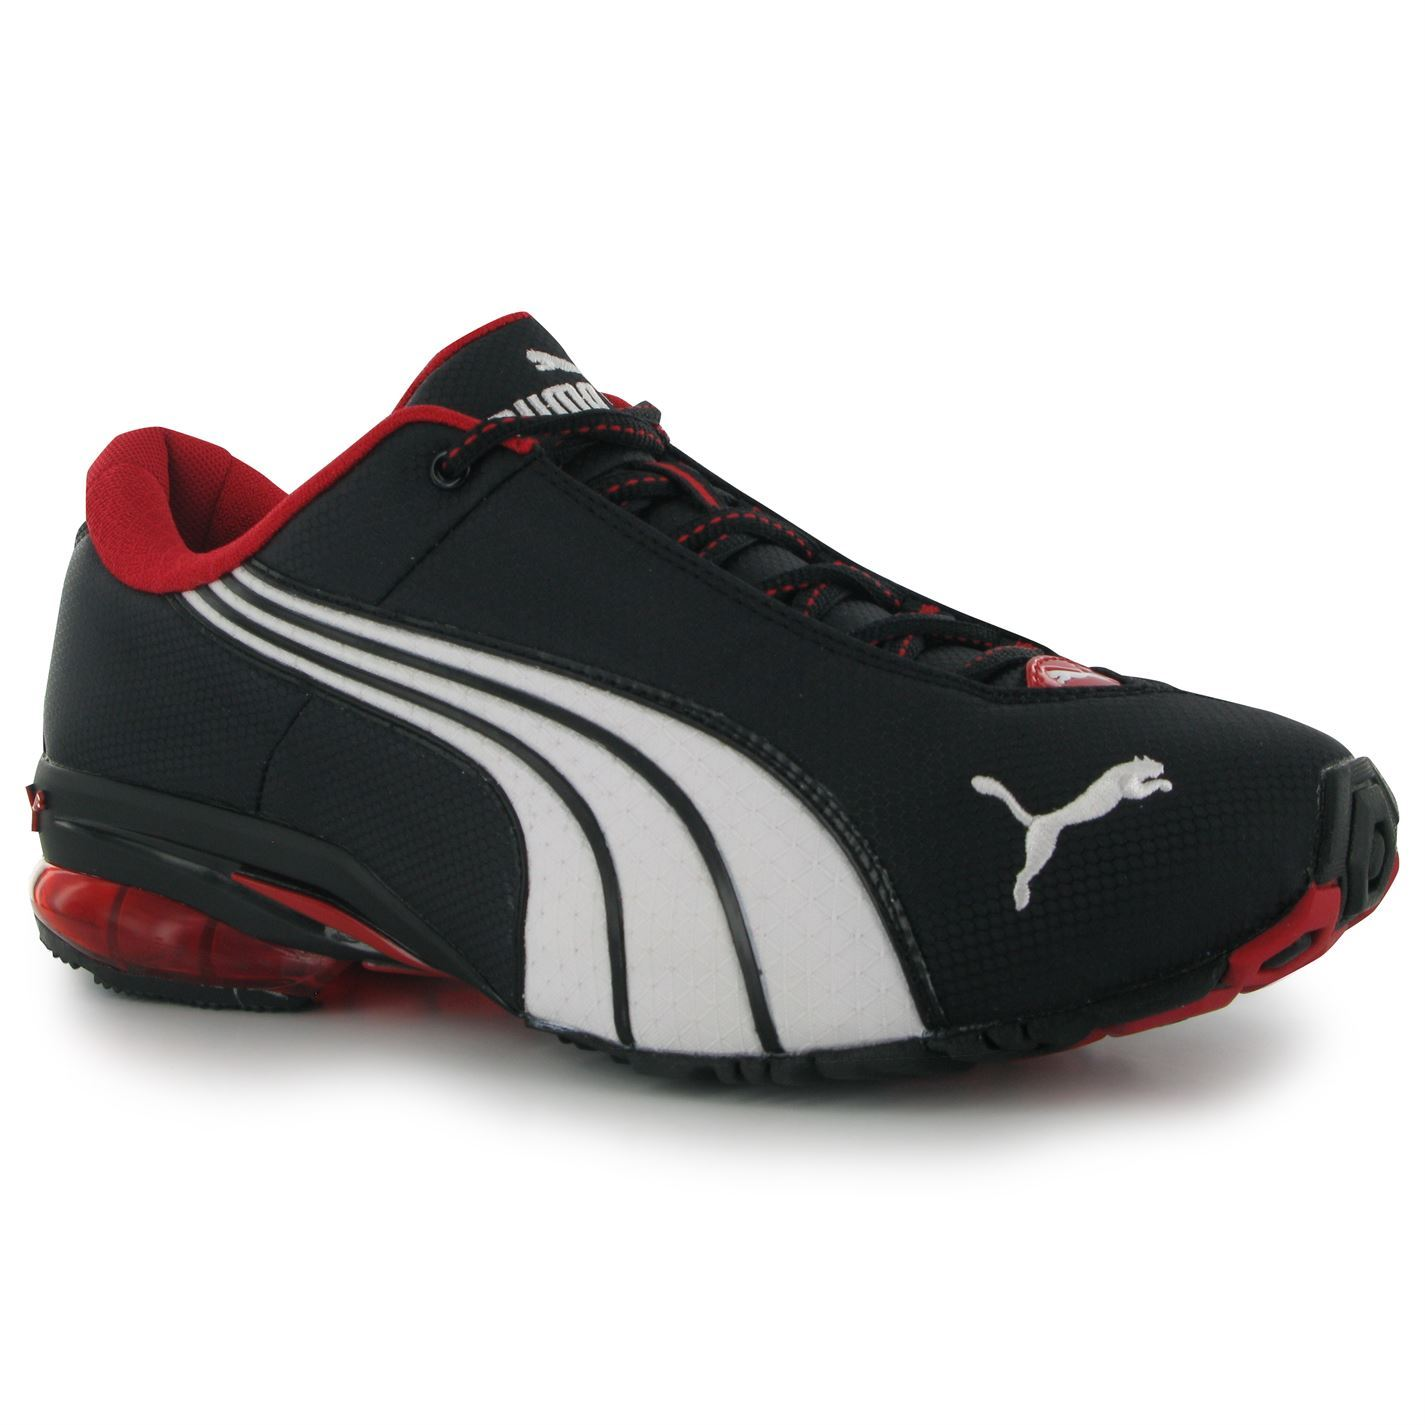 Puma Nylon Jago Nylon Puma hombres Zapatos Trainers Black/Red Zapatillas Sports Footwear 206ed7